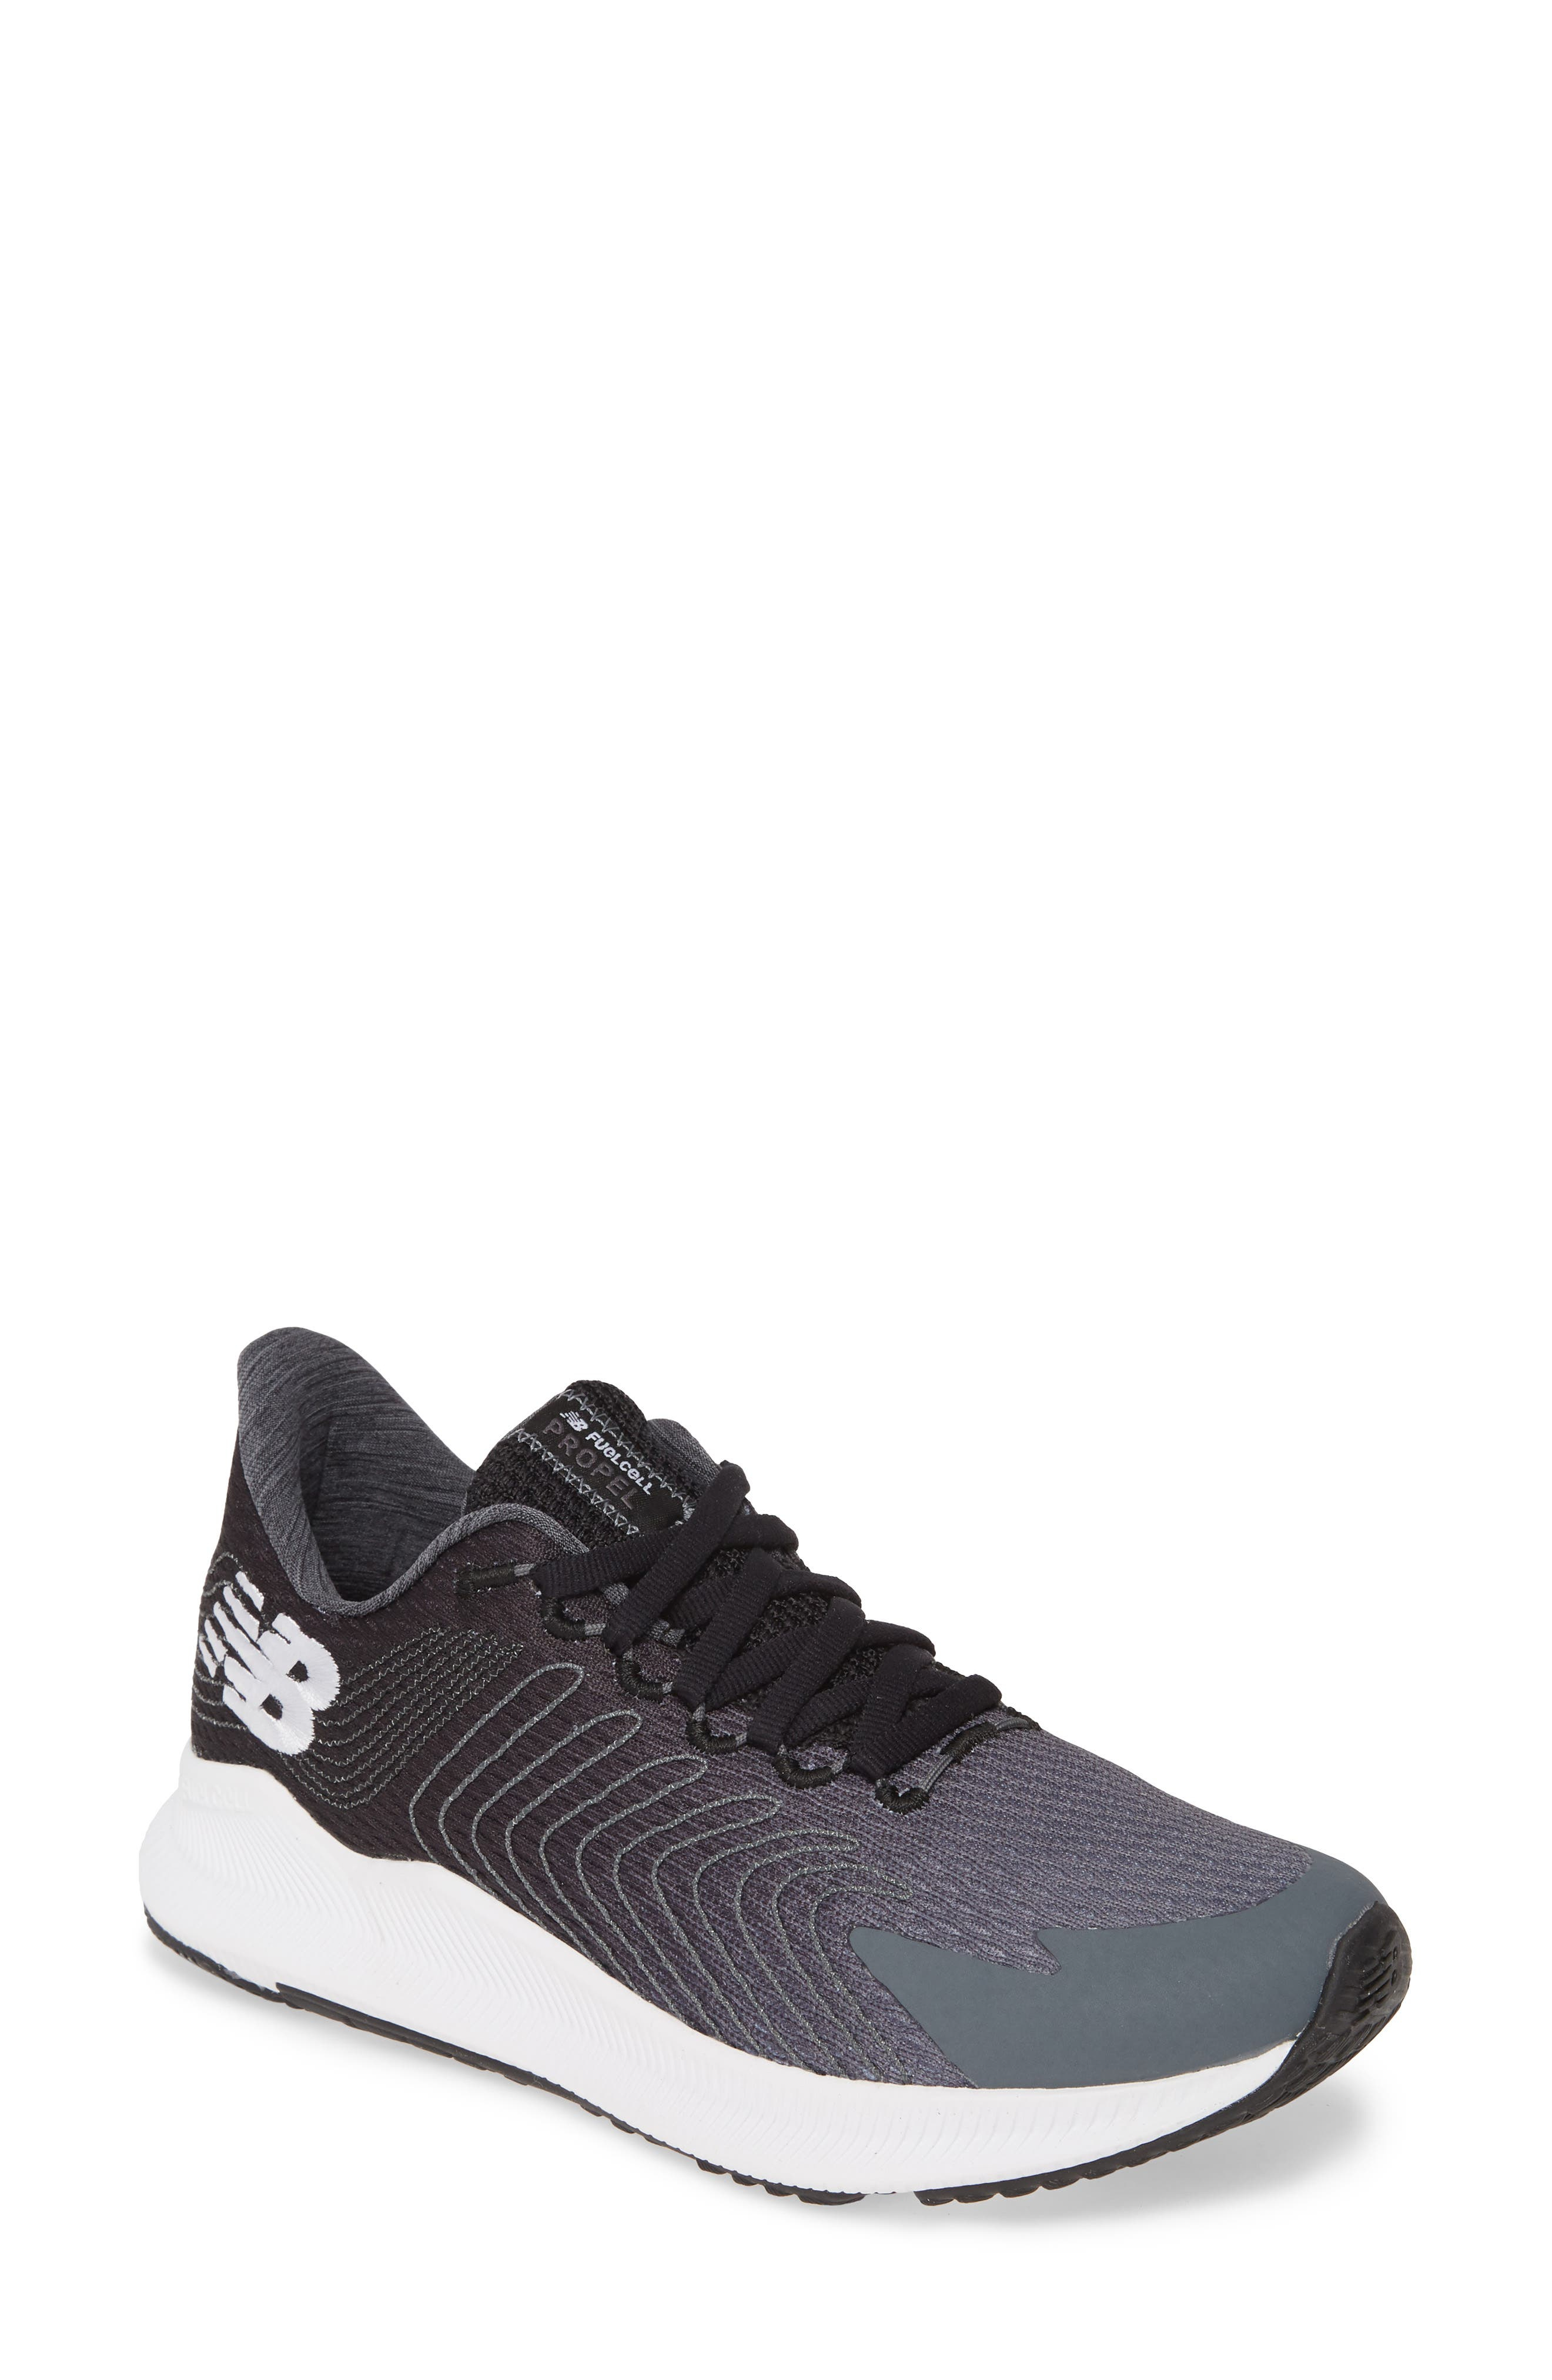 New Balance sneakers WRL 420 SF ladies gray Internet